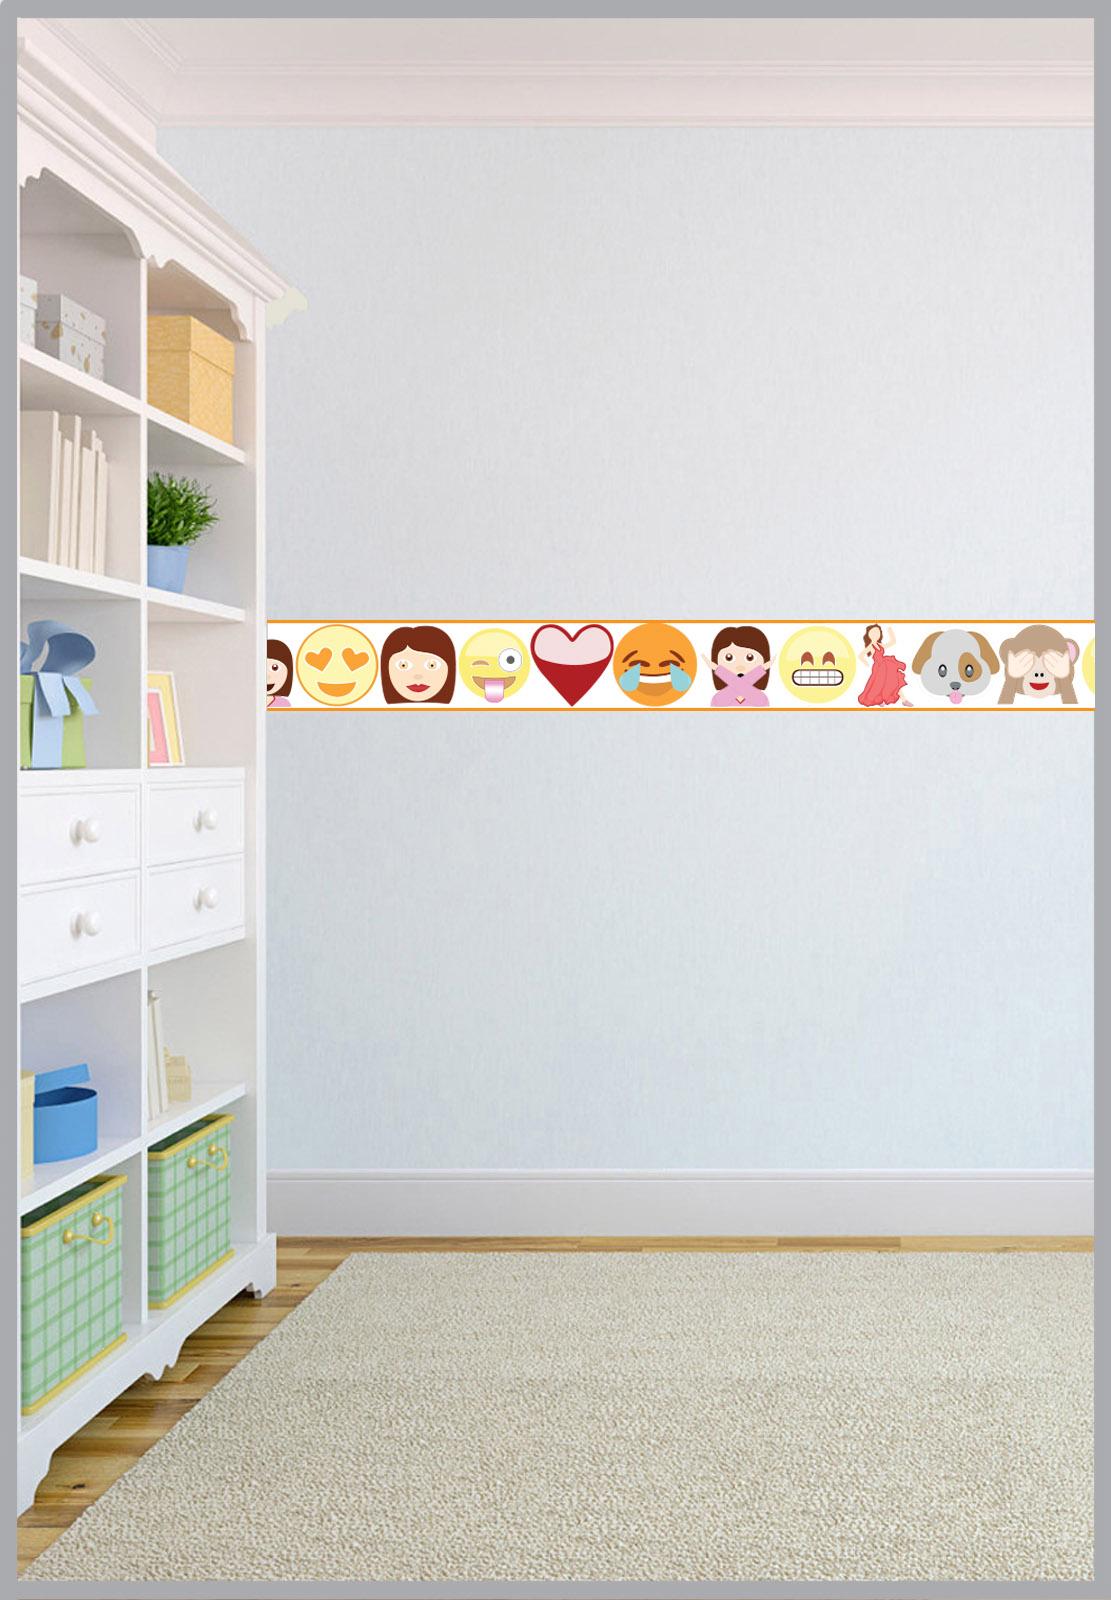 Kids Bedroom Wall Wallpaper Borders Children039s Kids Nursery Boys Girls Bedroom